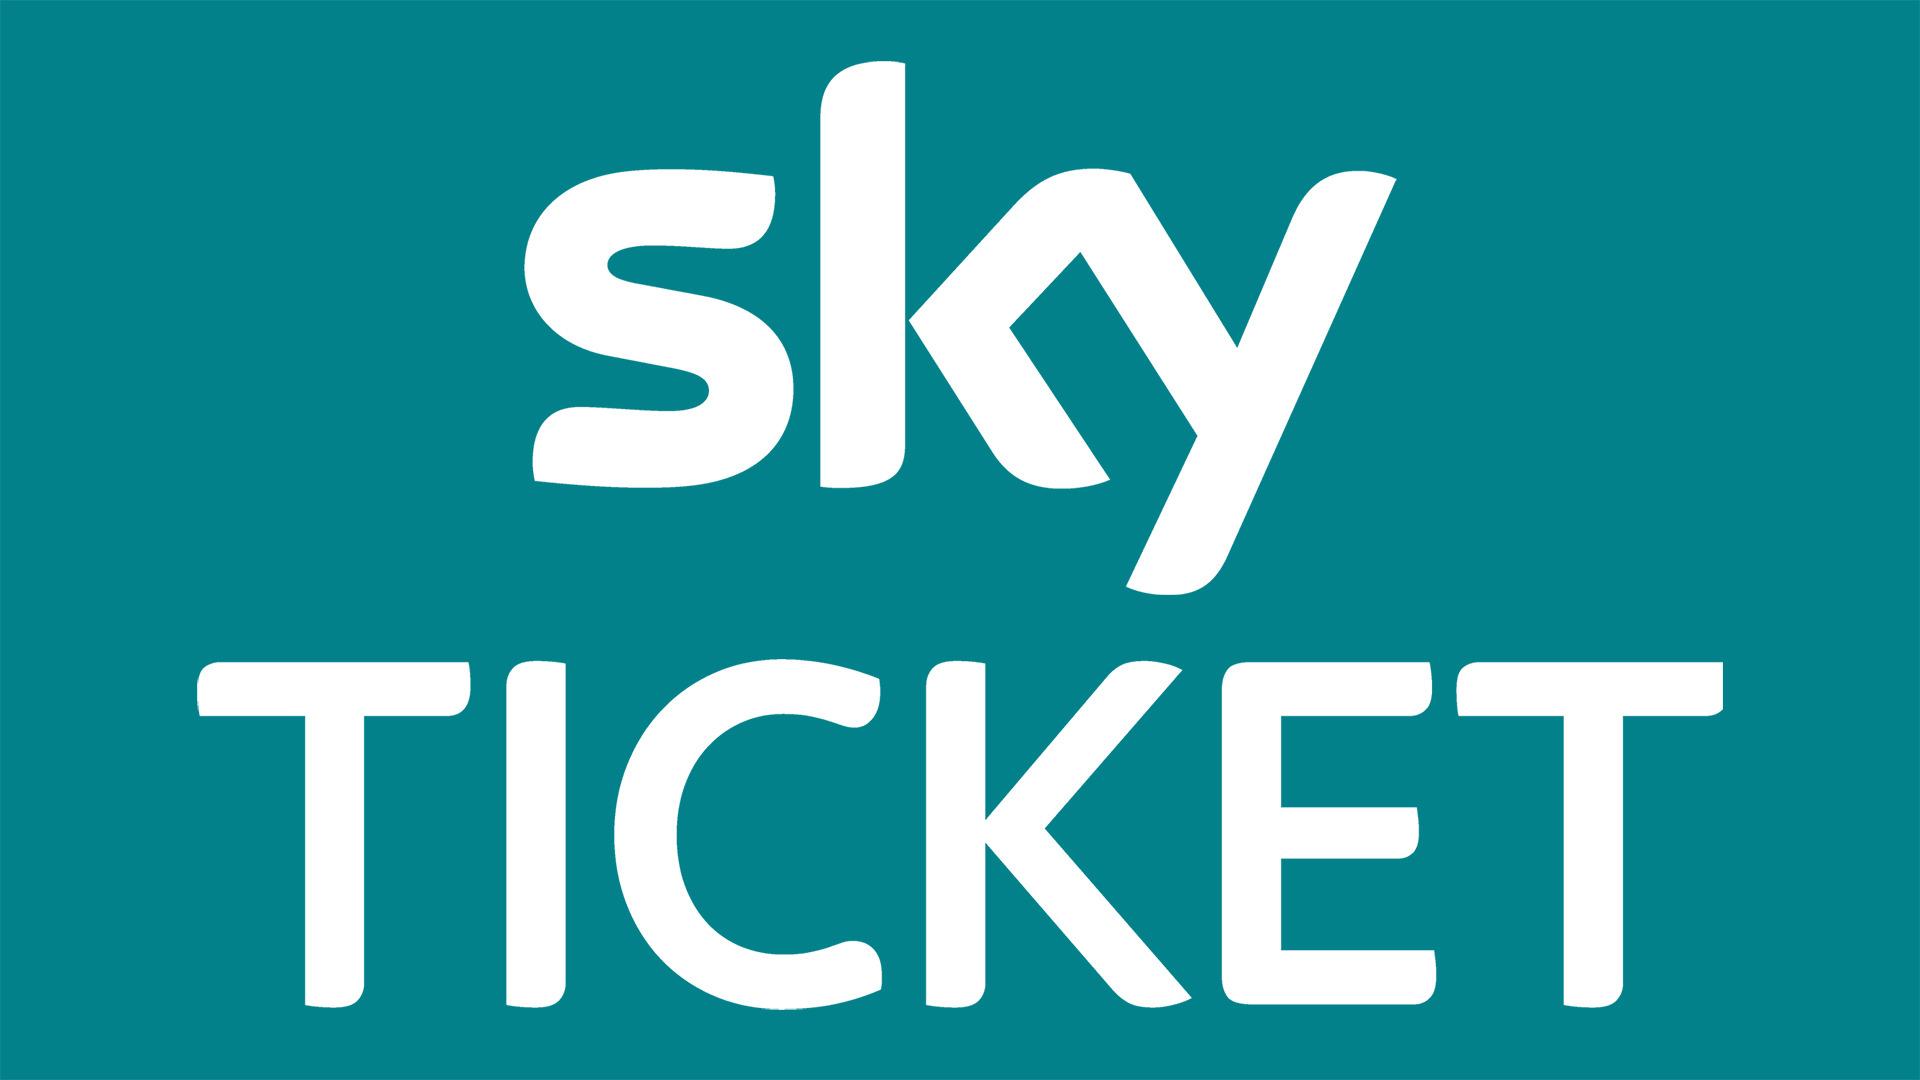 Streaming, Tv, Fernsehen, Filme, Serien, Sky, Sky Ticket